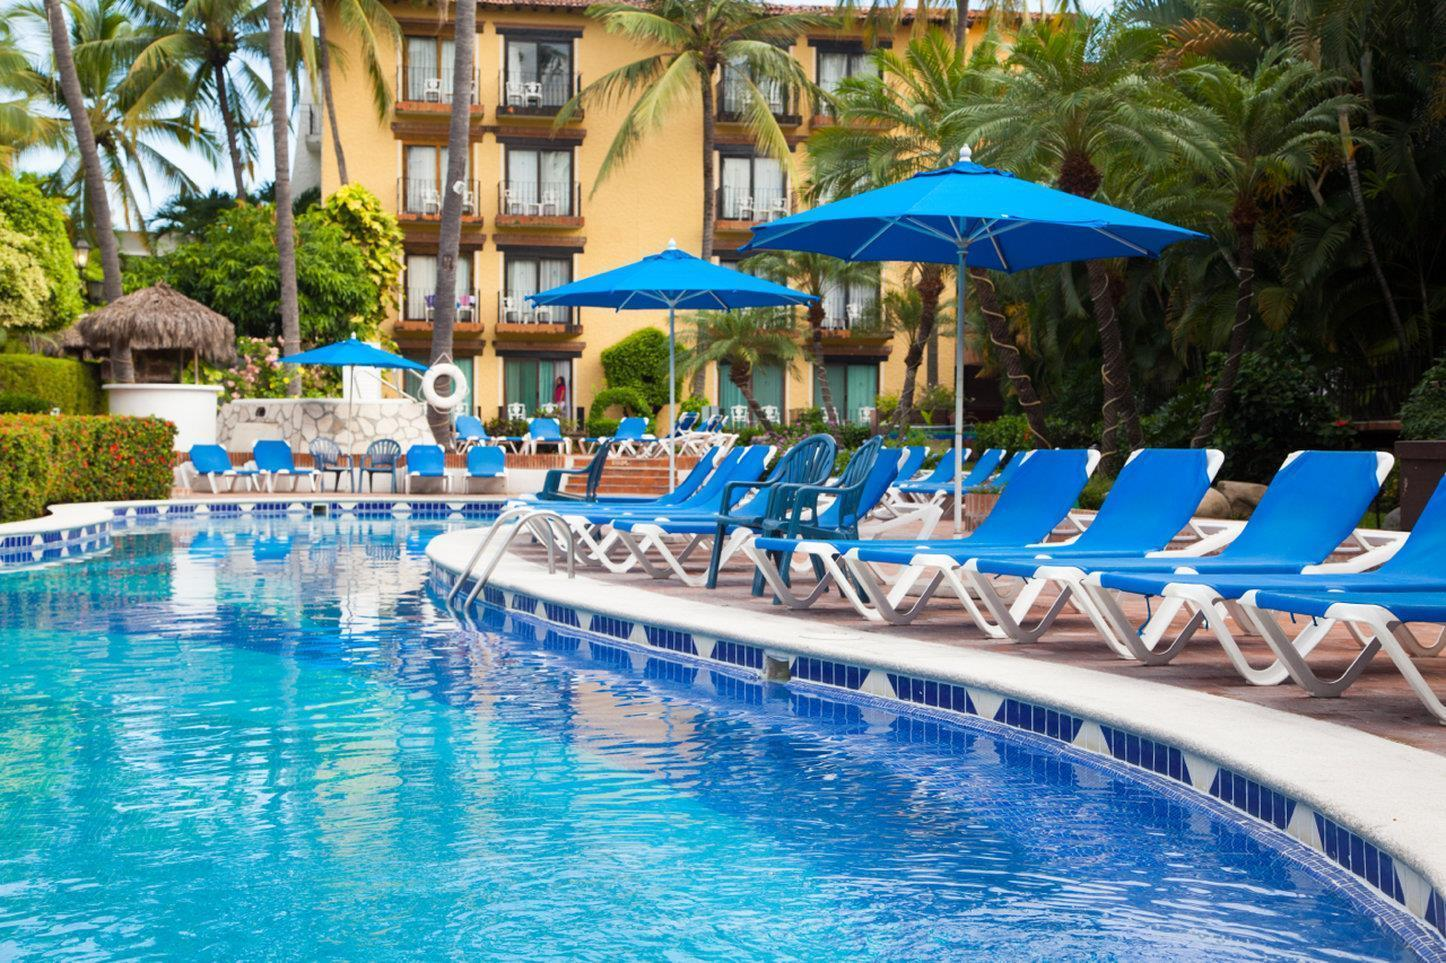 Review Hacienda Buenaventura Hotel & Mexican Charm - All Inclusive